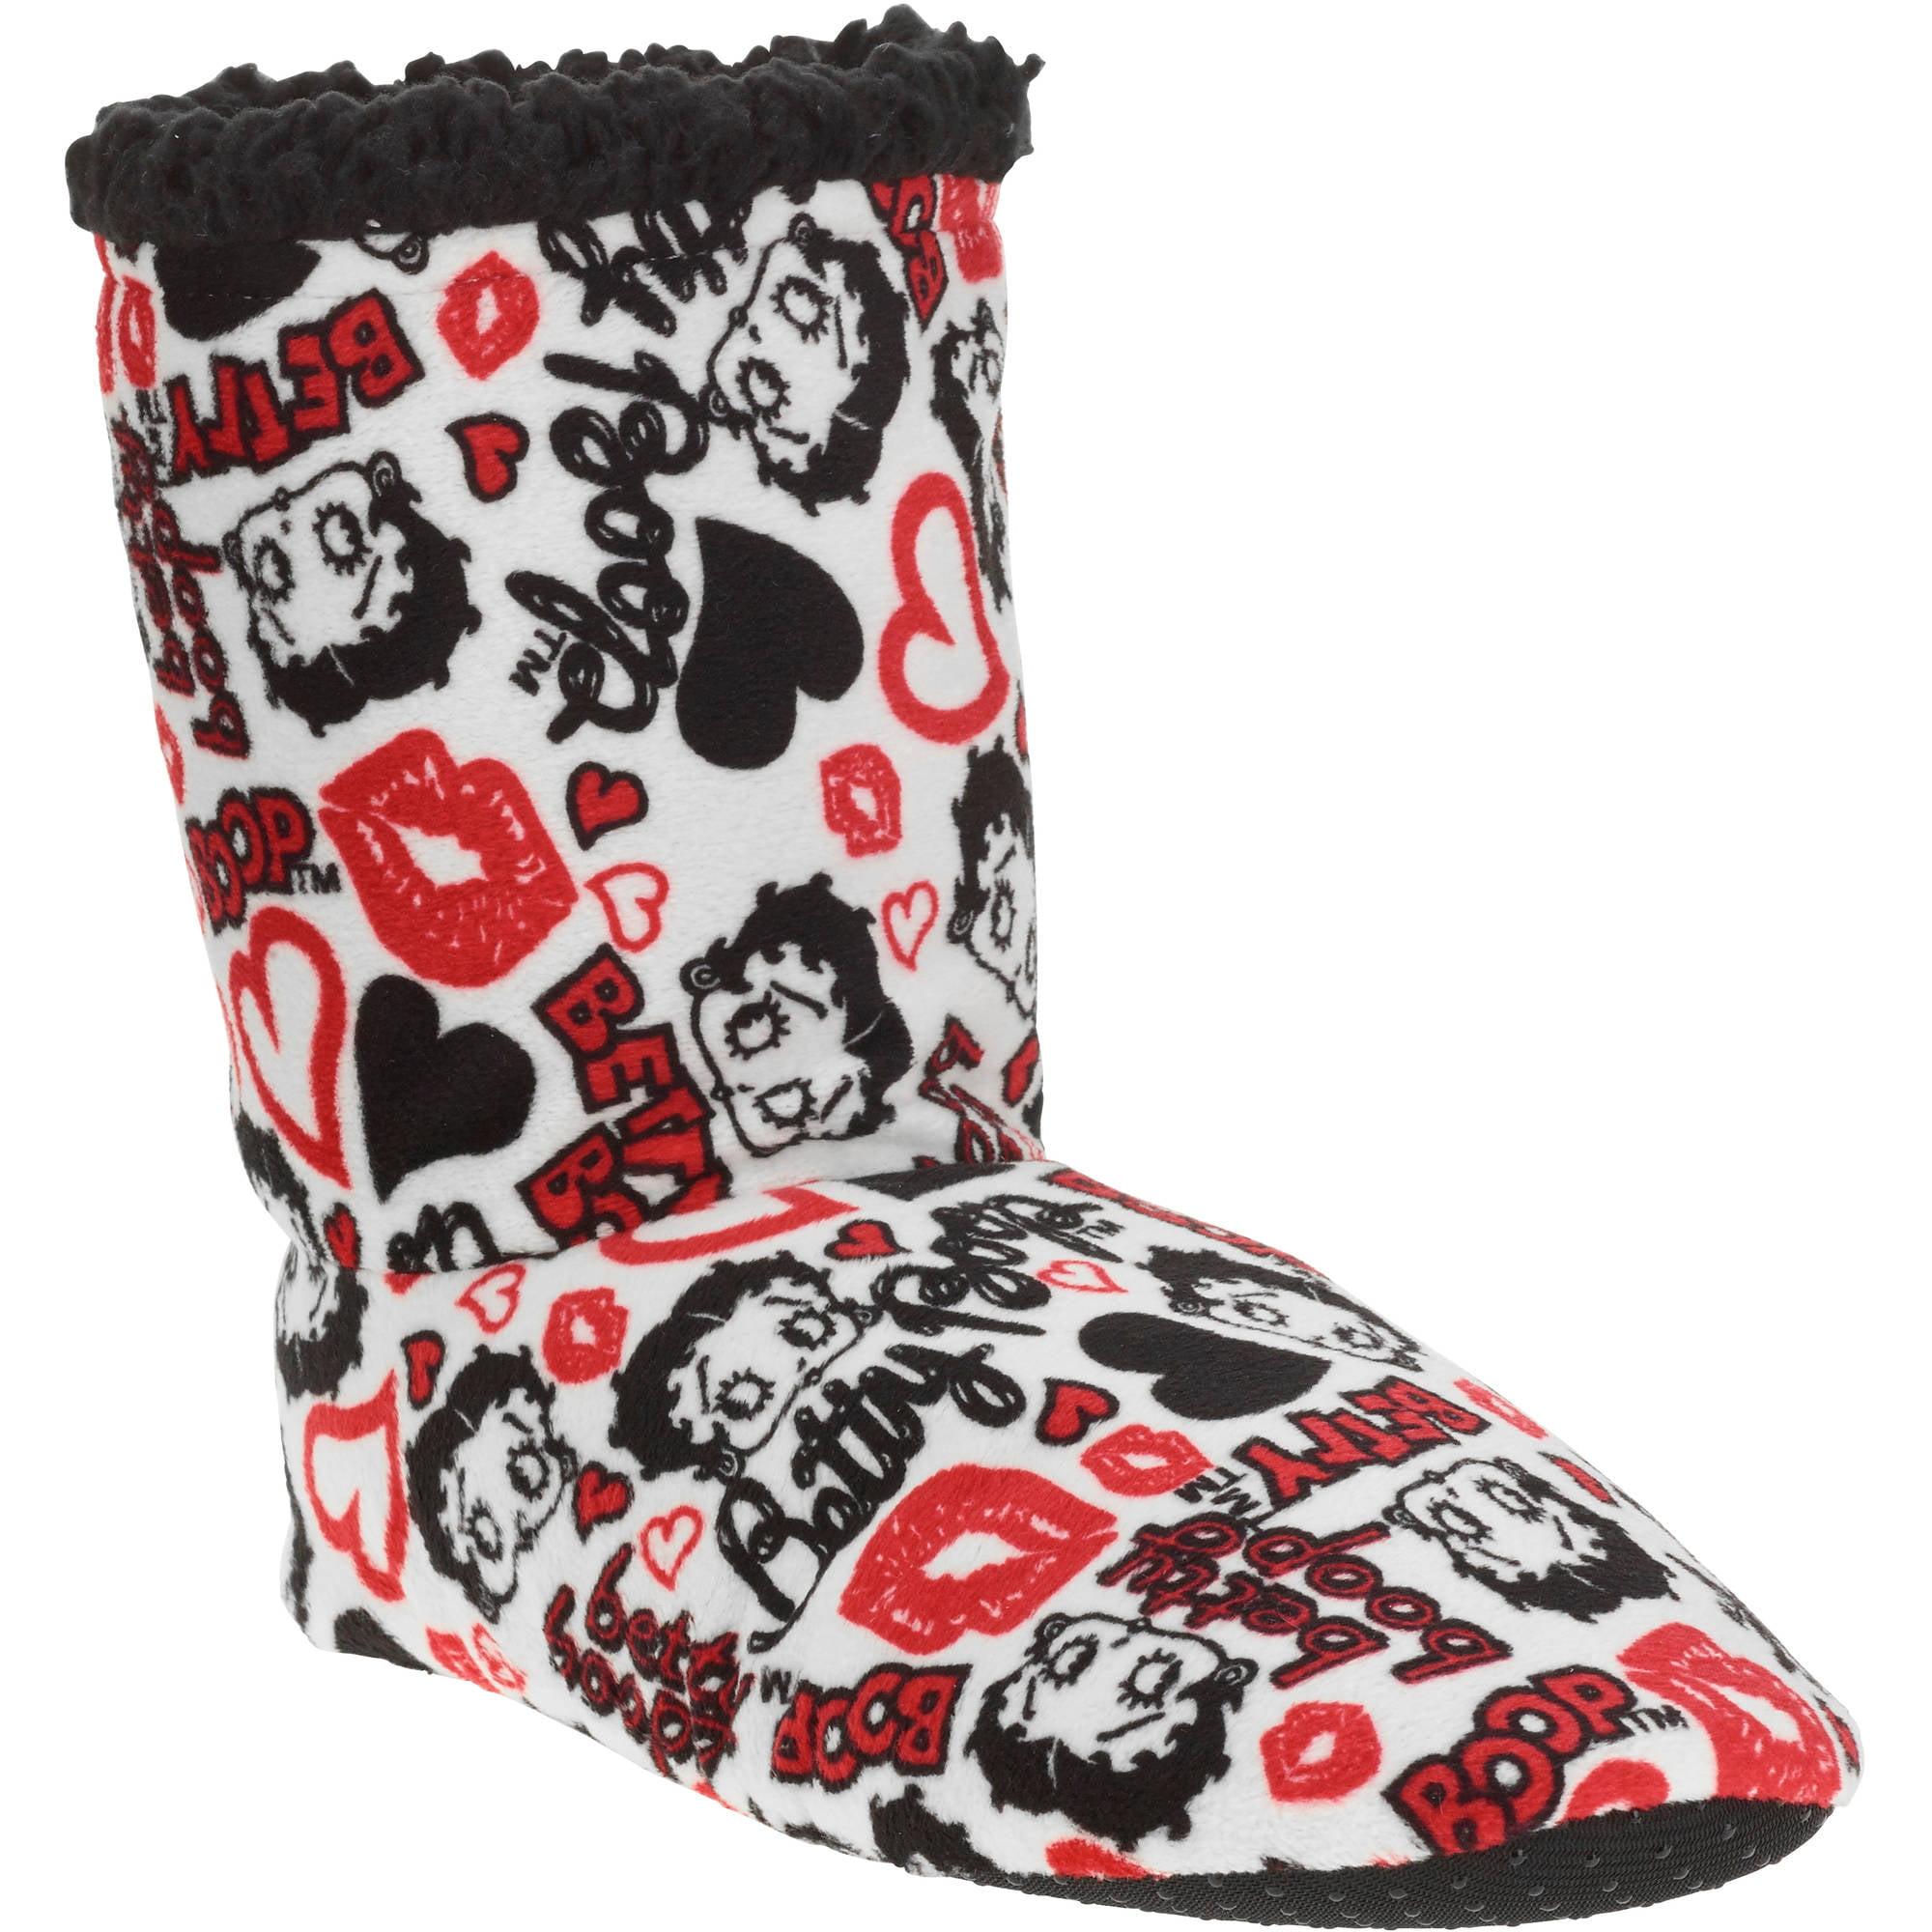 Silky Suede Fuzzy Babba Betty Boop Printed Bootie Slipper Socks